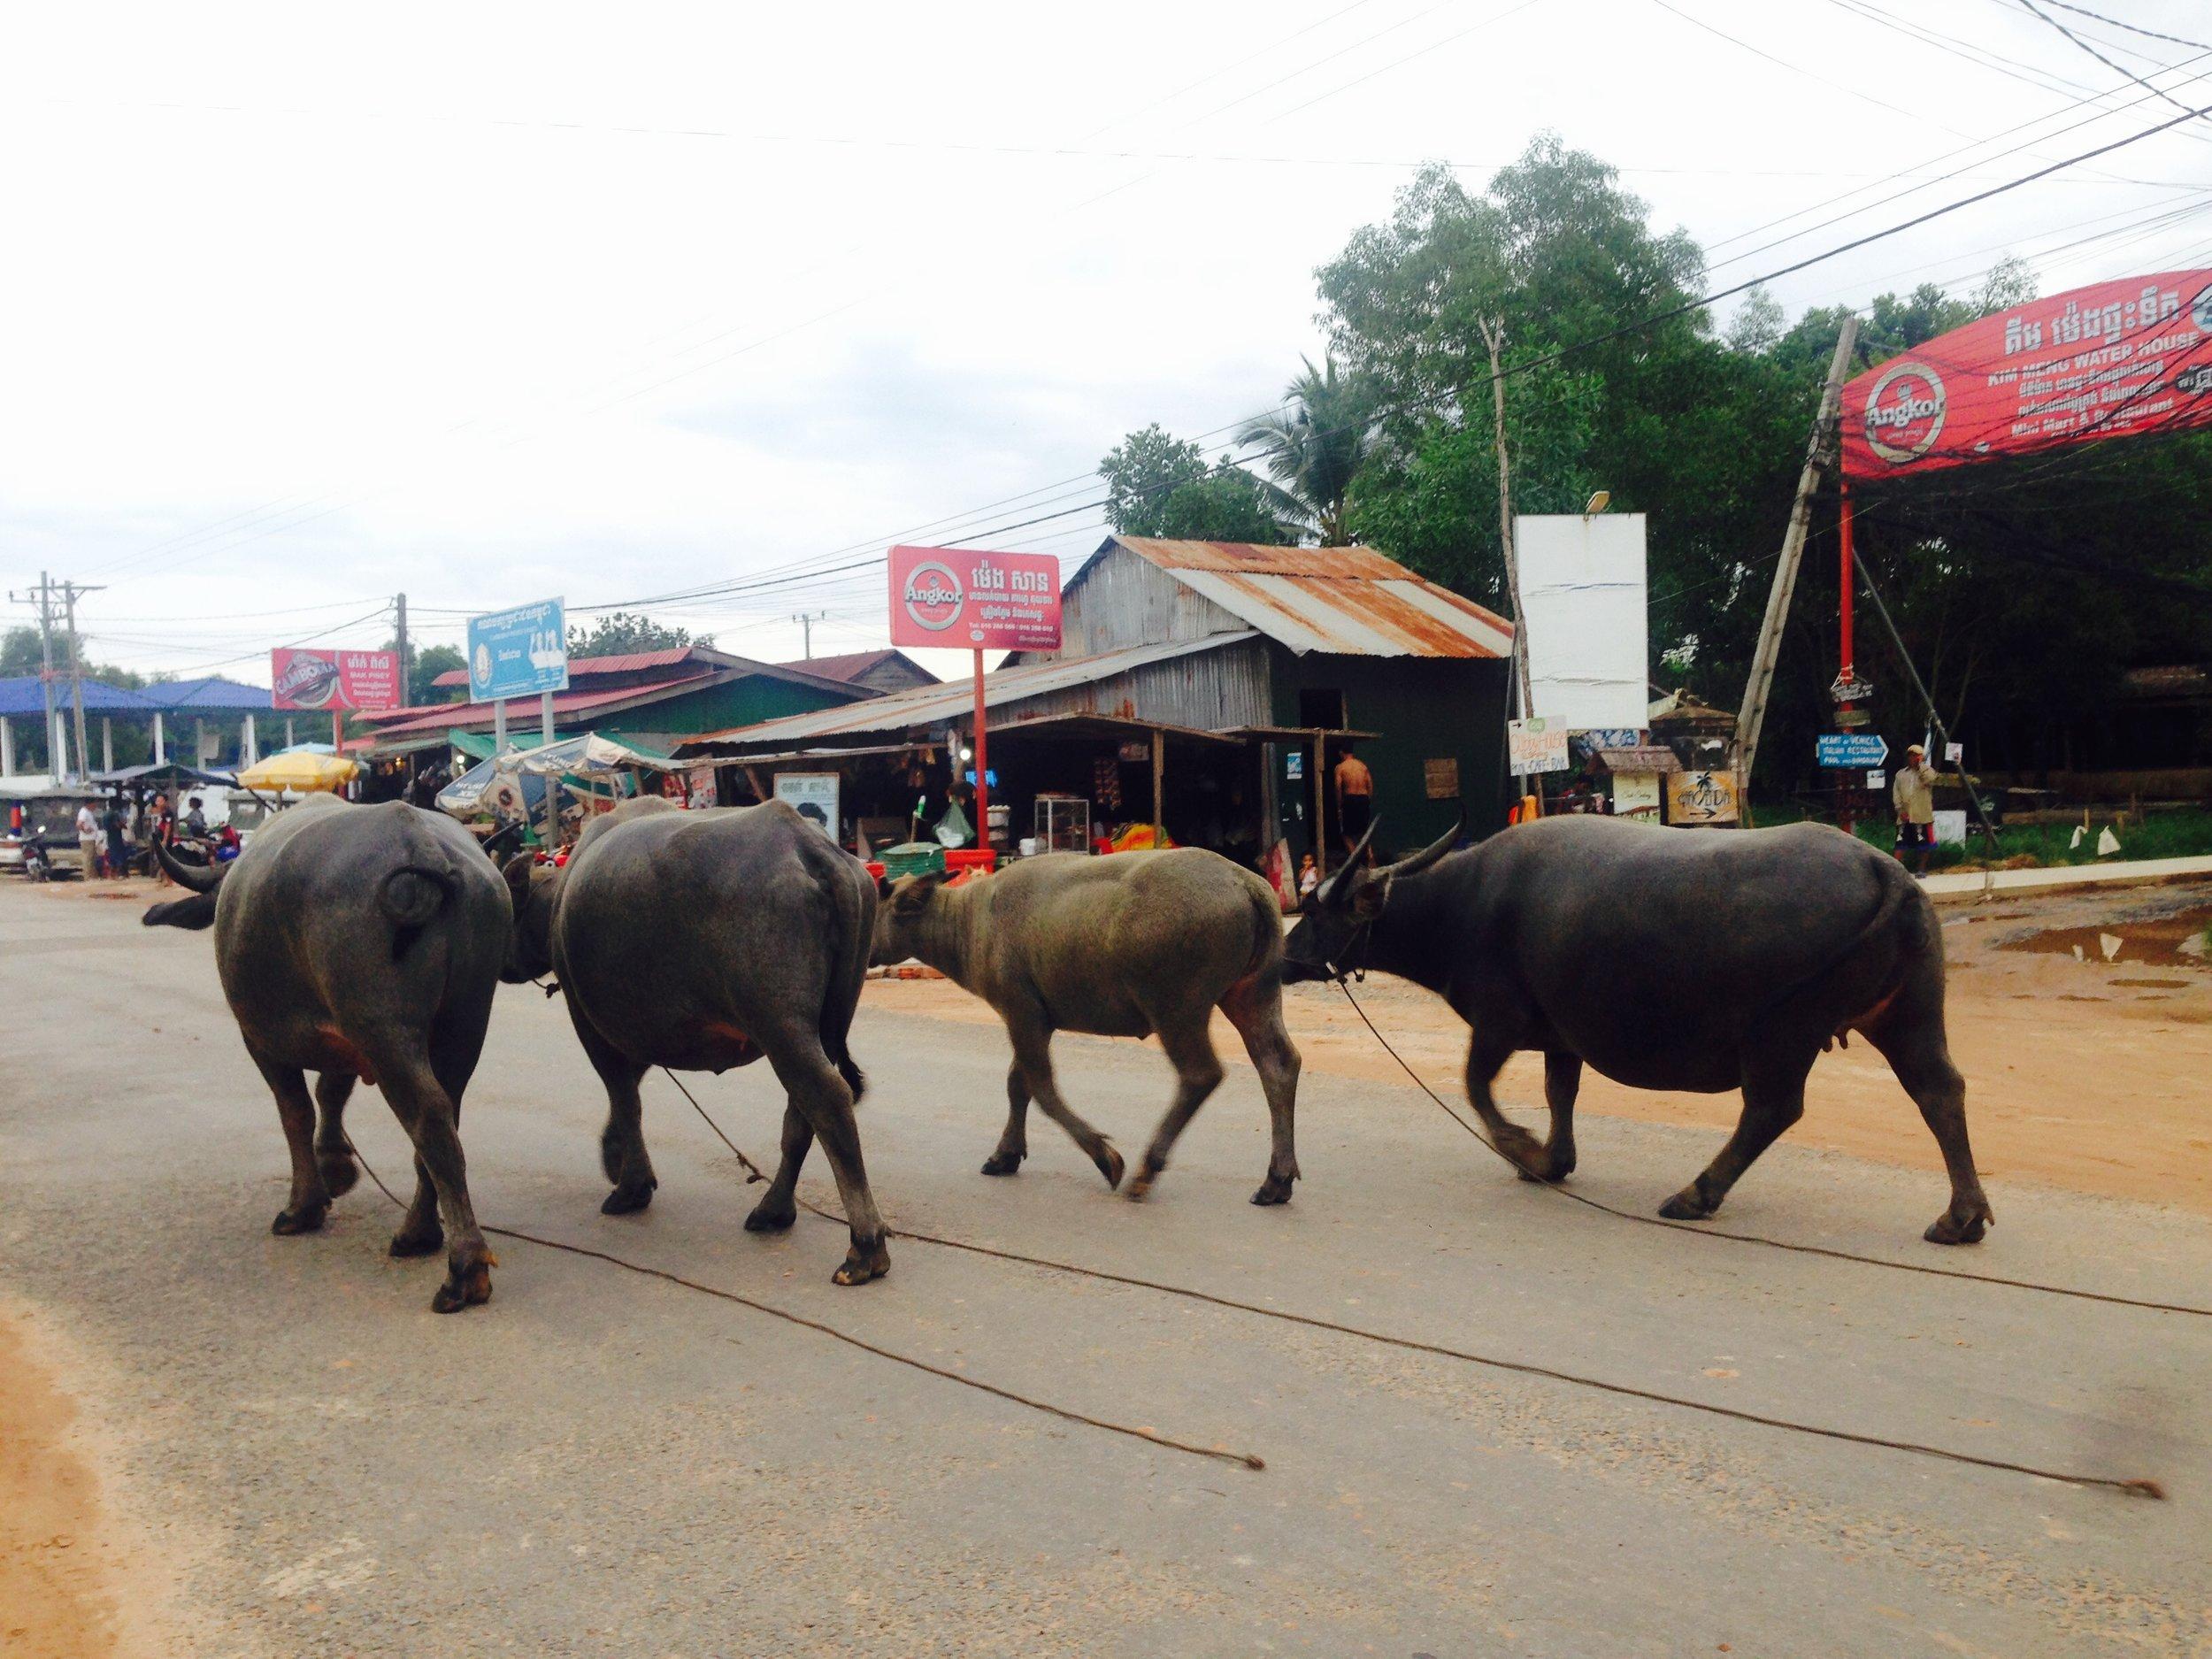 Water buffalo parading the Main Street running through Otres Village